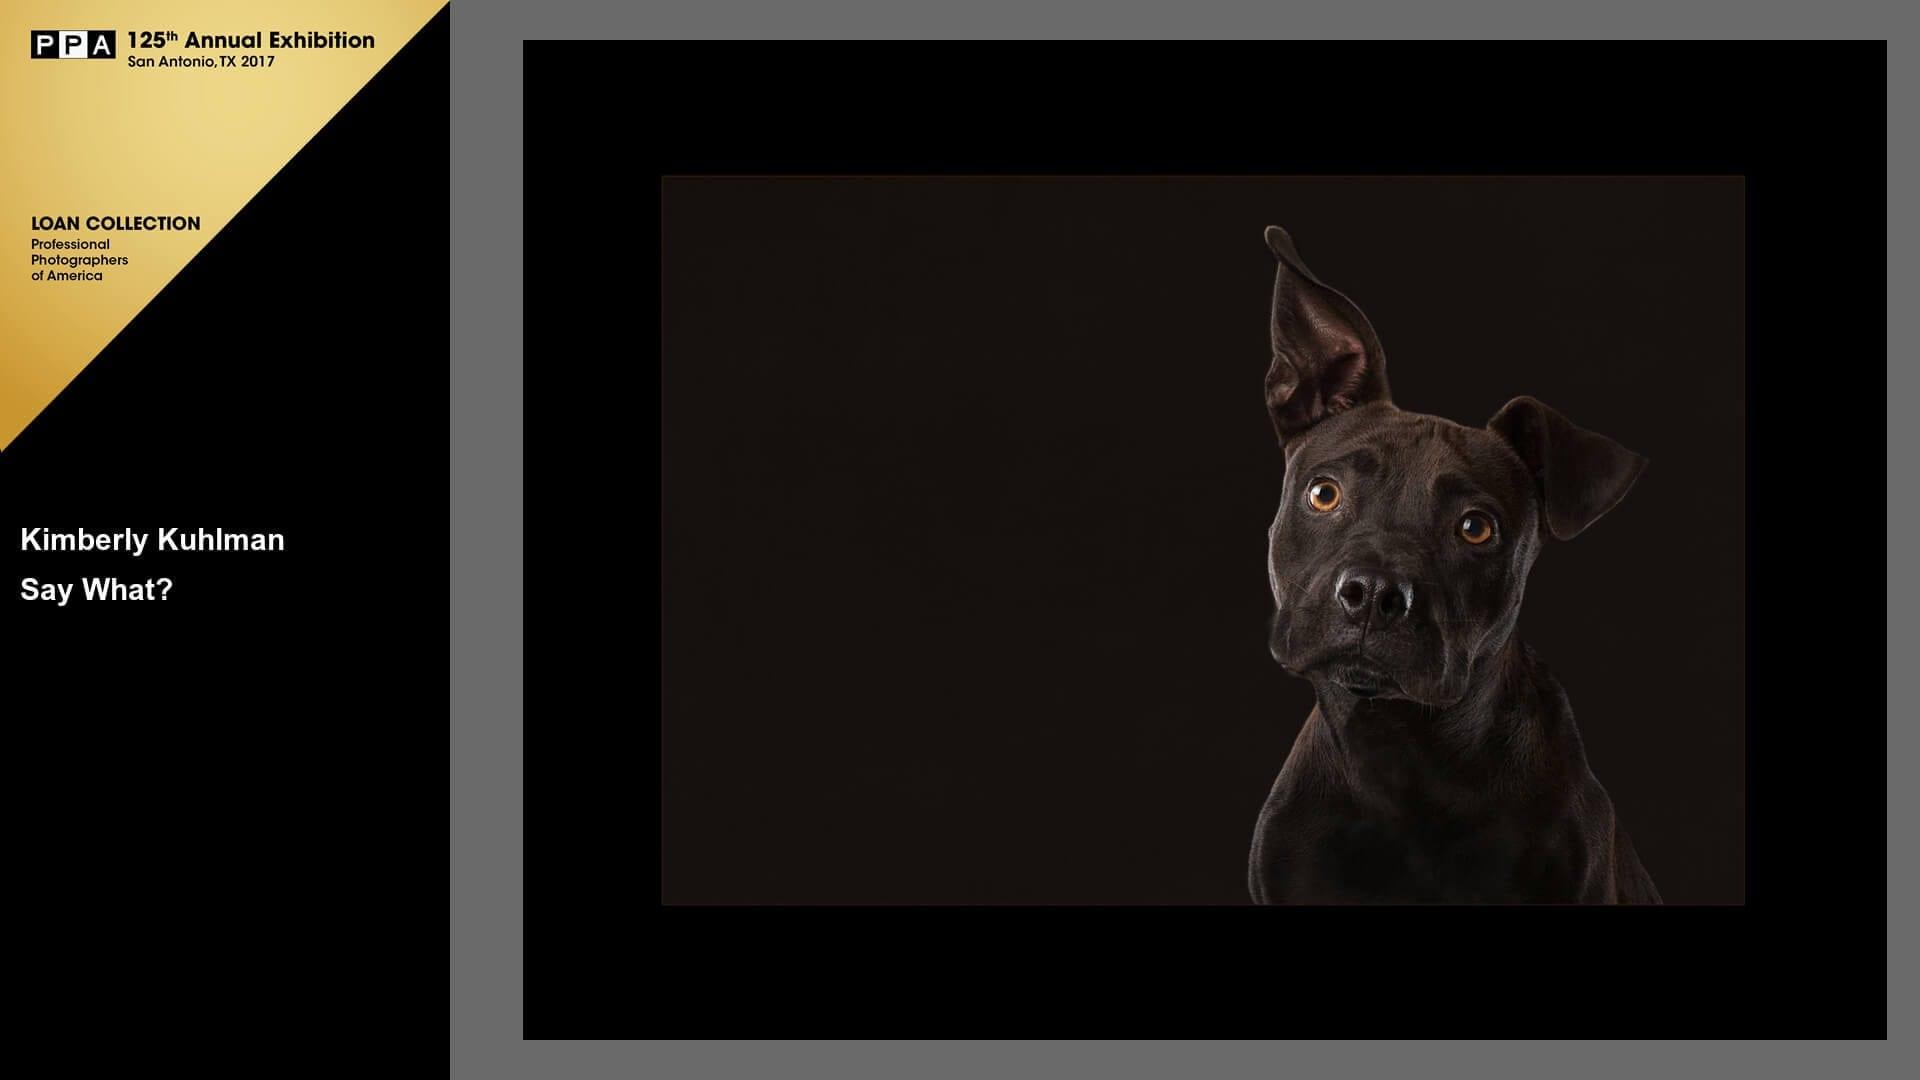 Say What IPC 2016 Pitbull Rescue Loan Grand Imaging Awards Animal Portrait